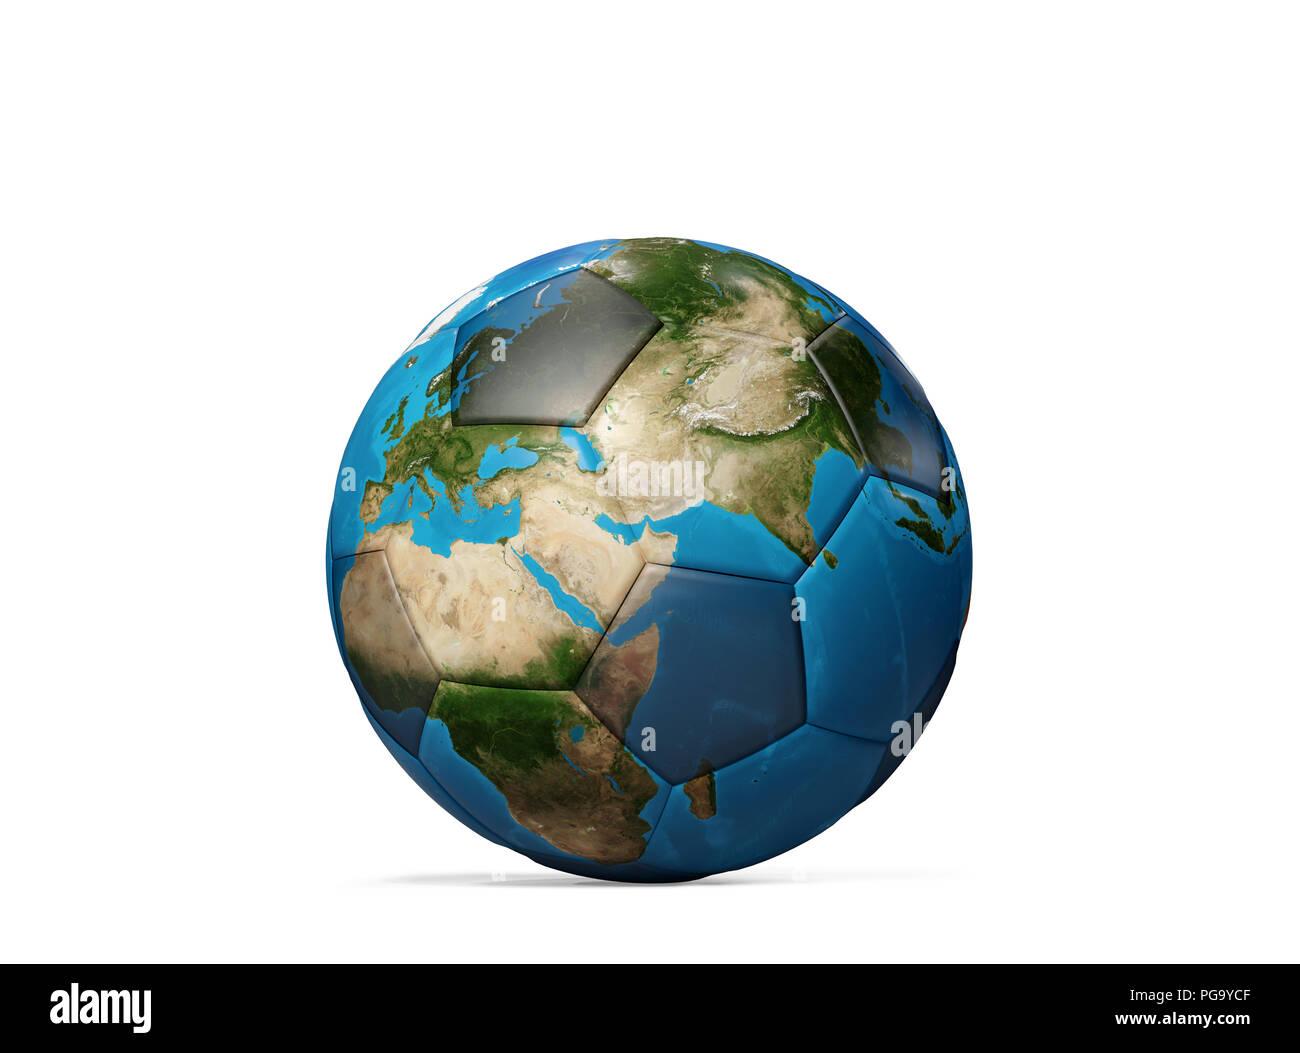 soccer world focused Qatar on world map globe 3d ... on the congo on world map, the sudan on world map, the united arab emirates on world map, the mali on world map, the sinai peninsula on world map, the west bank on world map, the caucasus on world map, the philippines on world map, the gaza strip on world map, the holy roman empire on world map, the netherlands on world map,